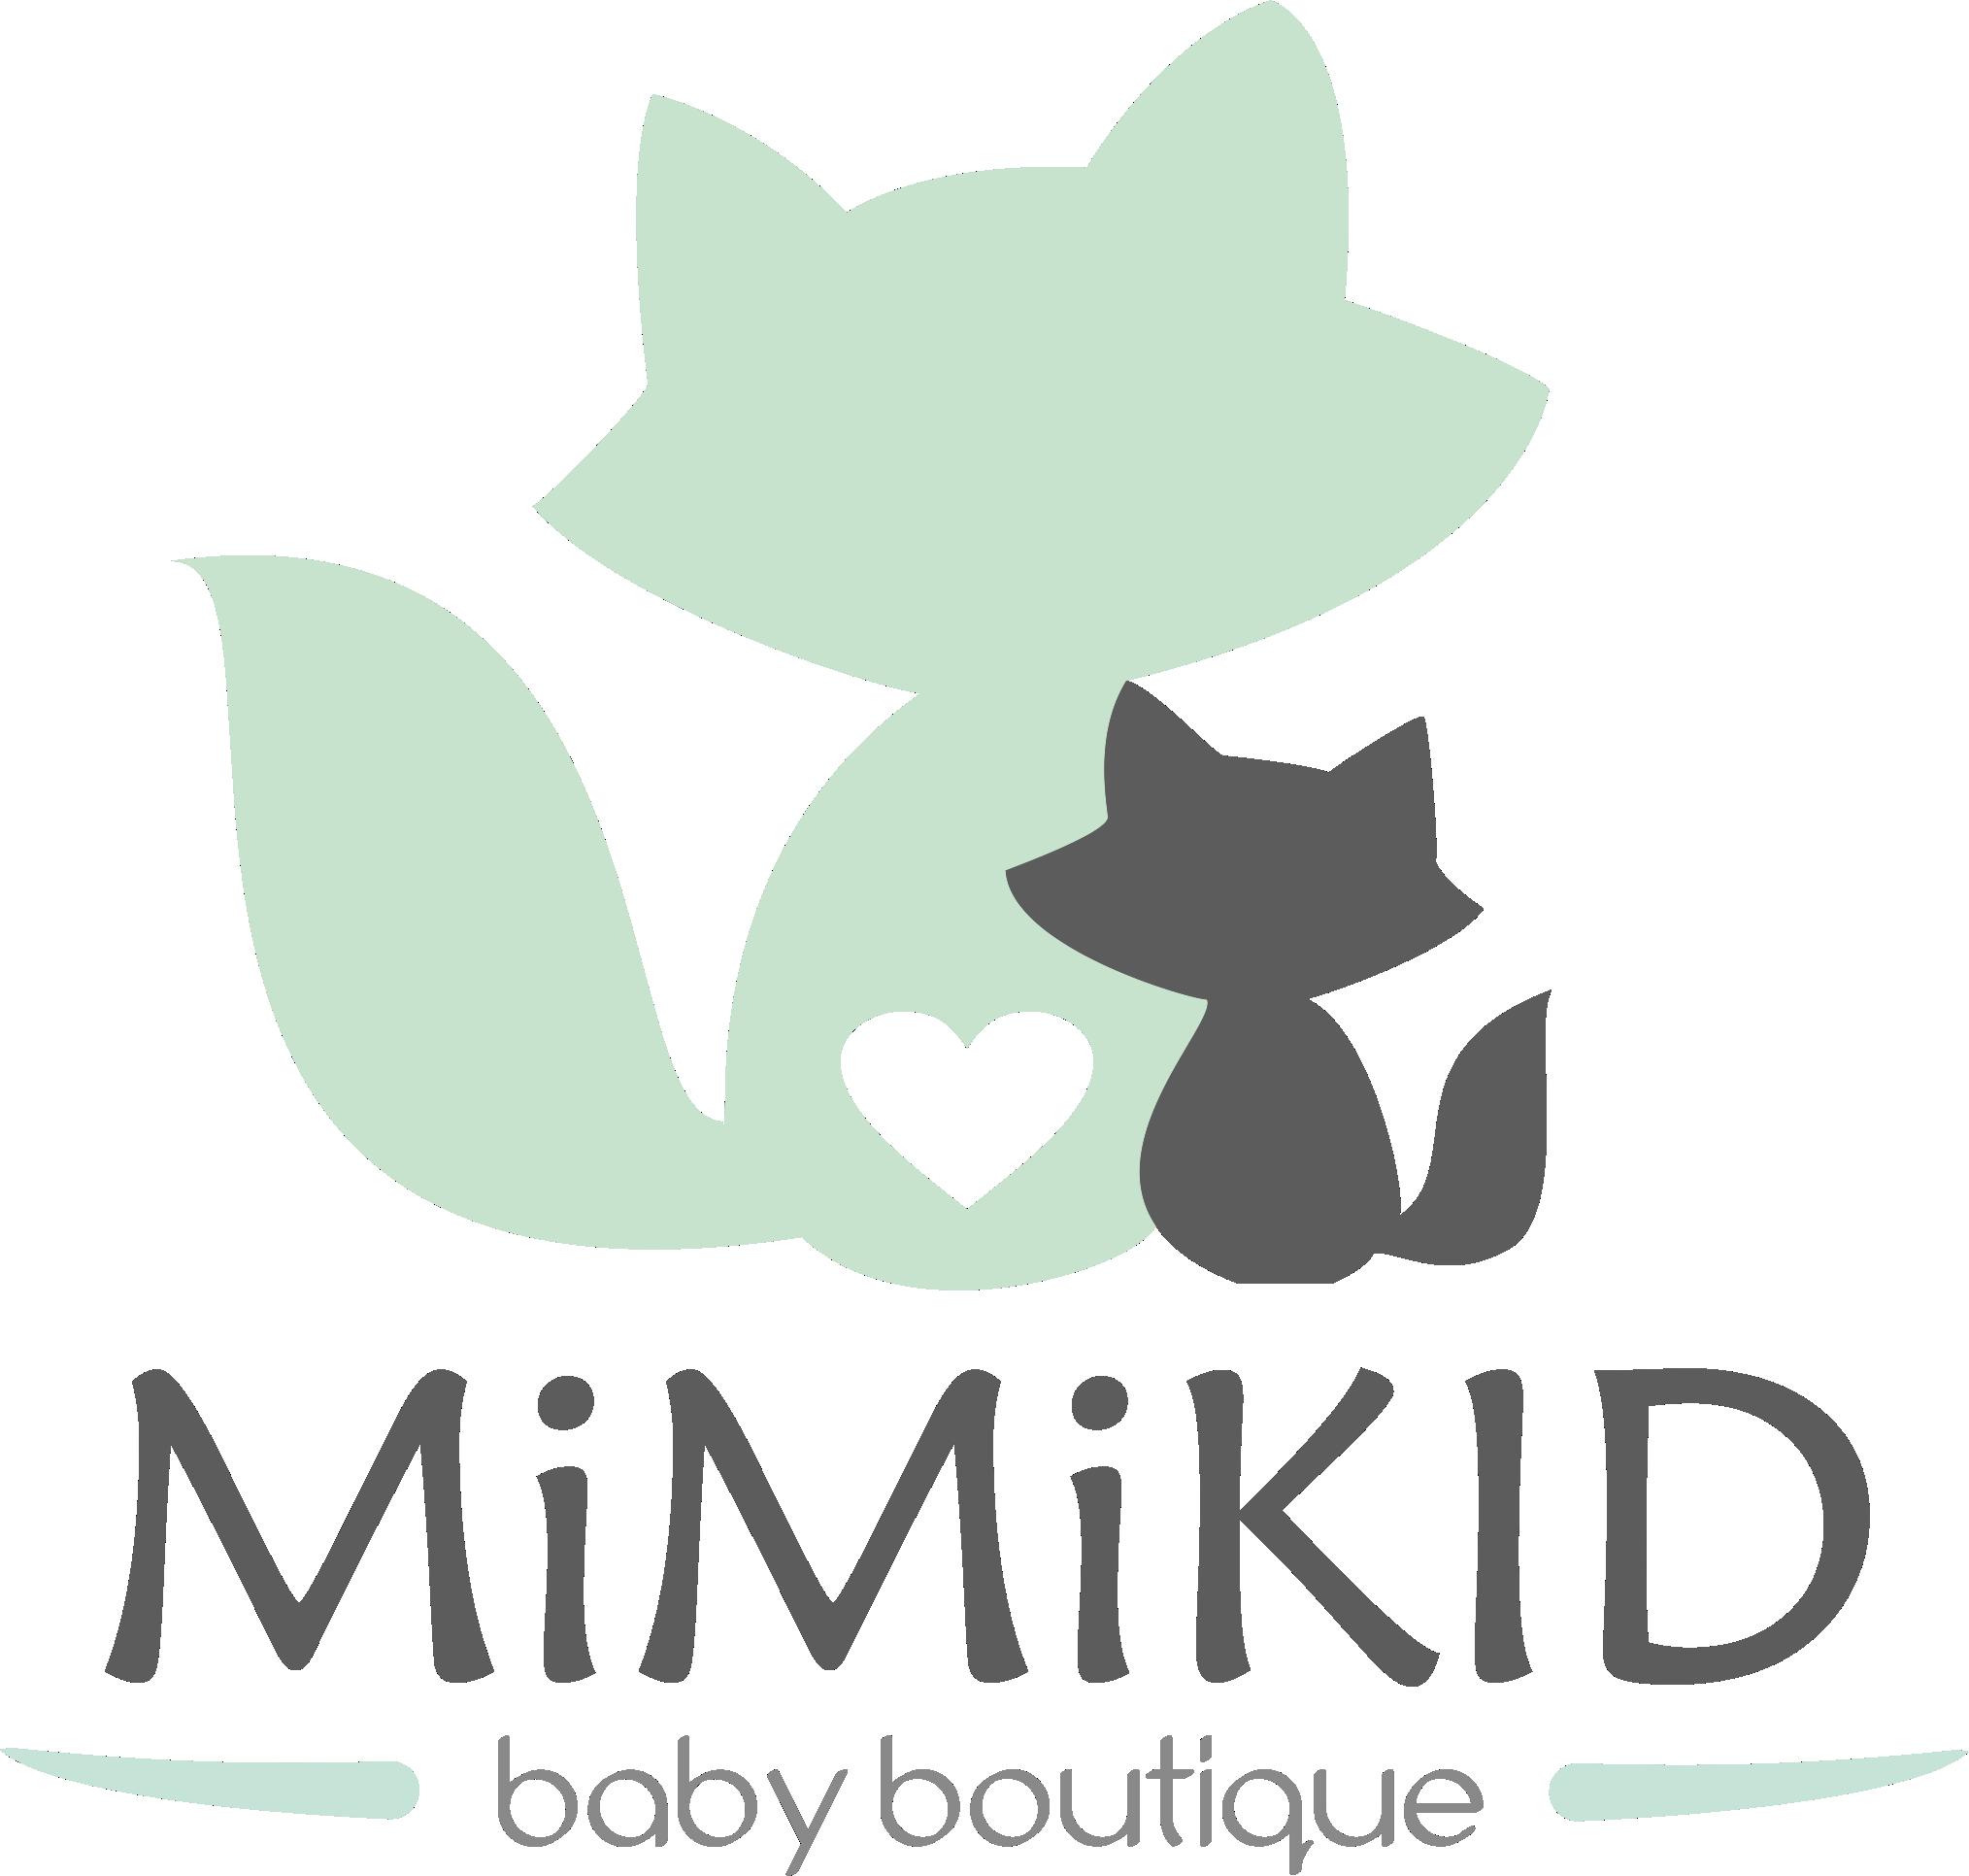 Mimikid